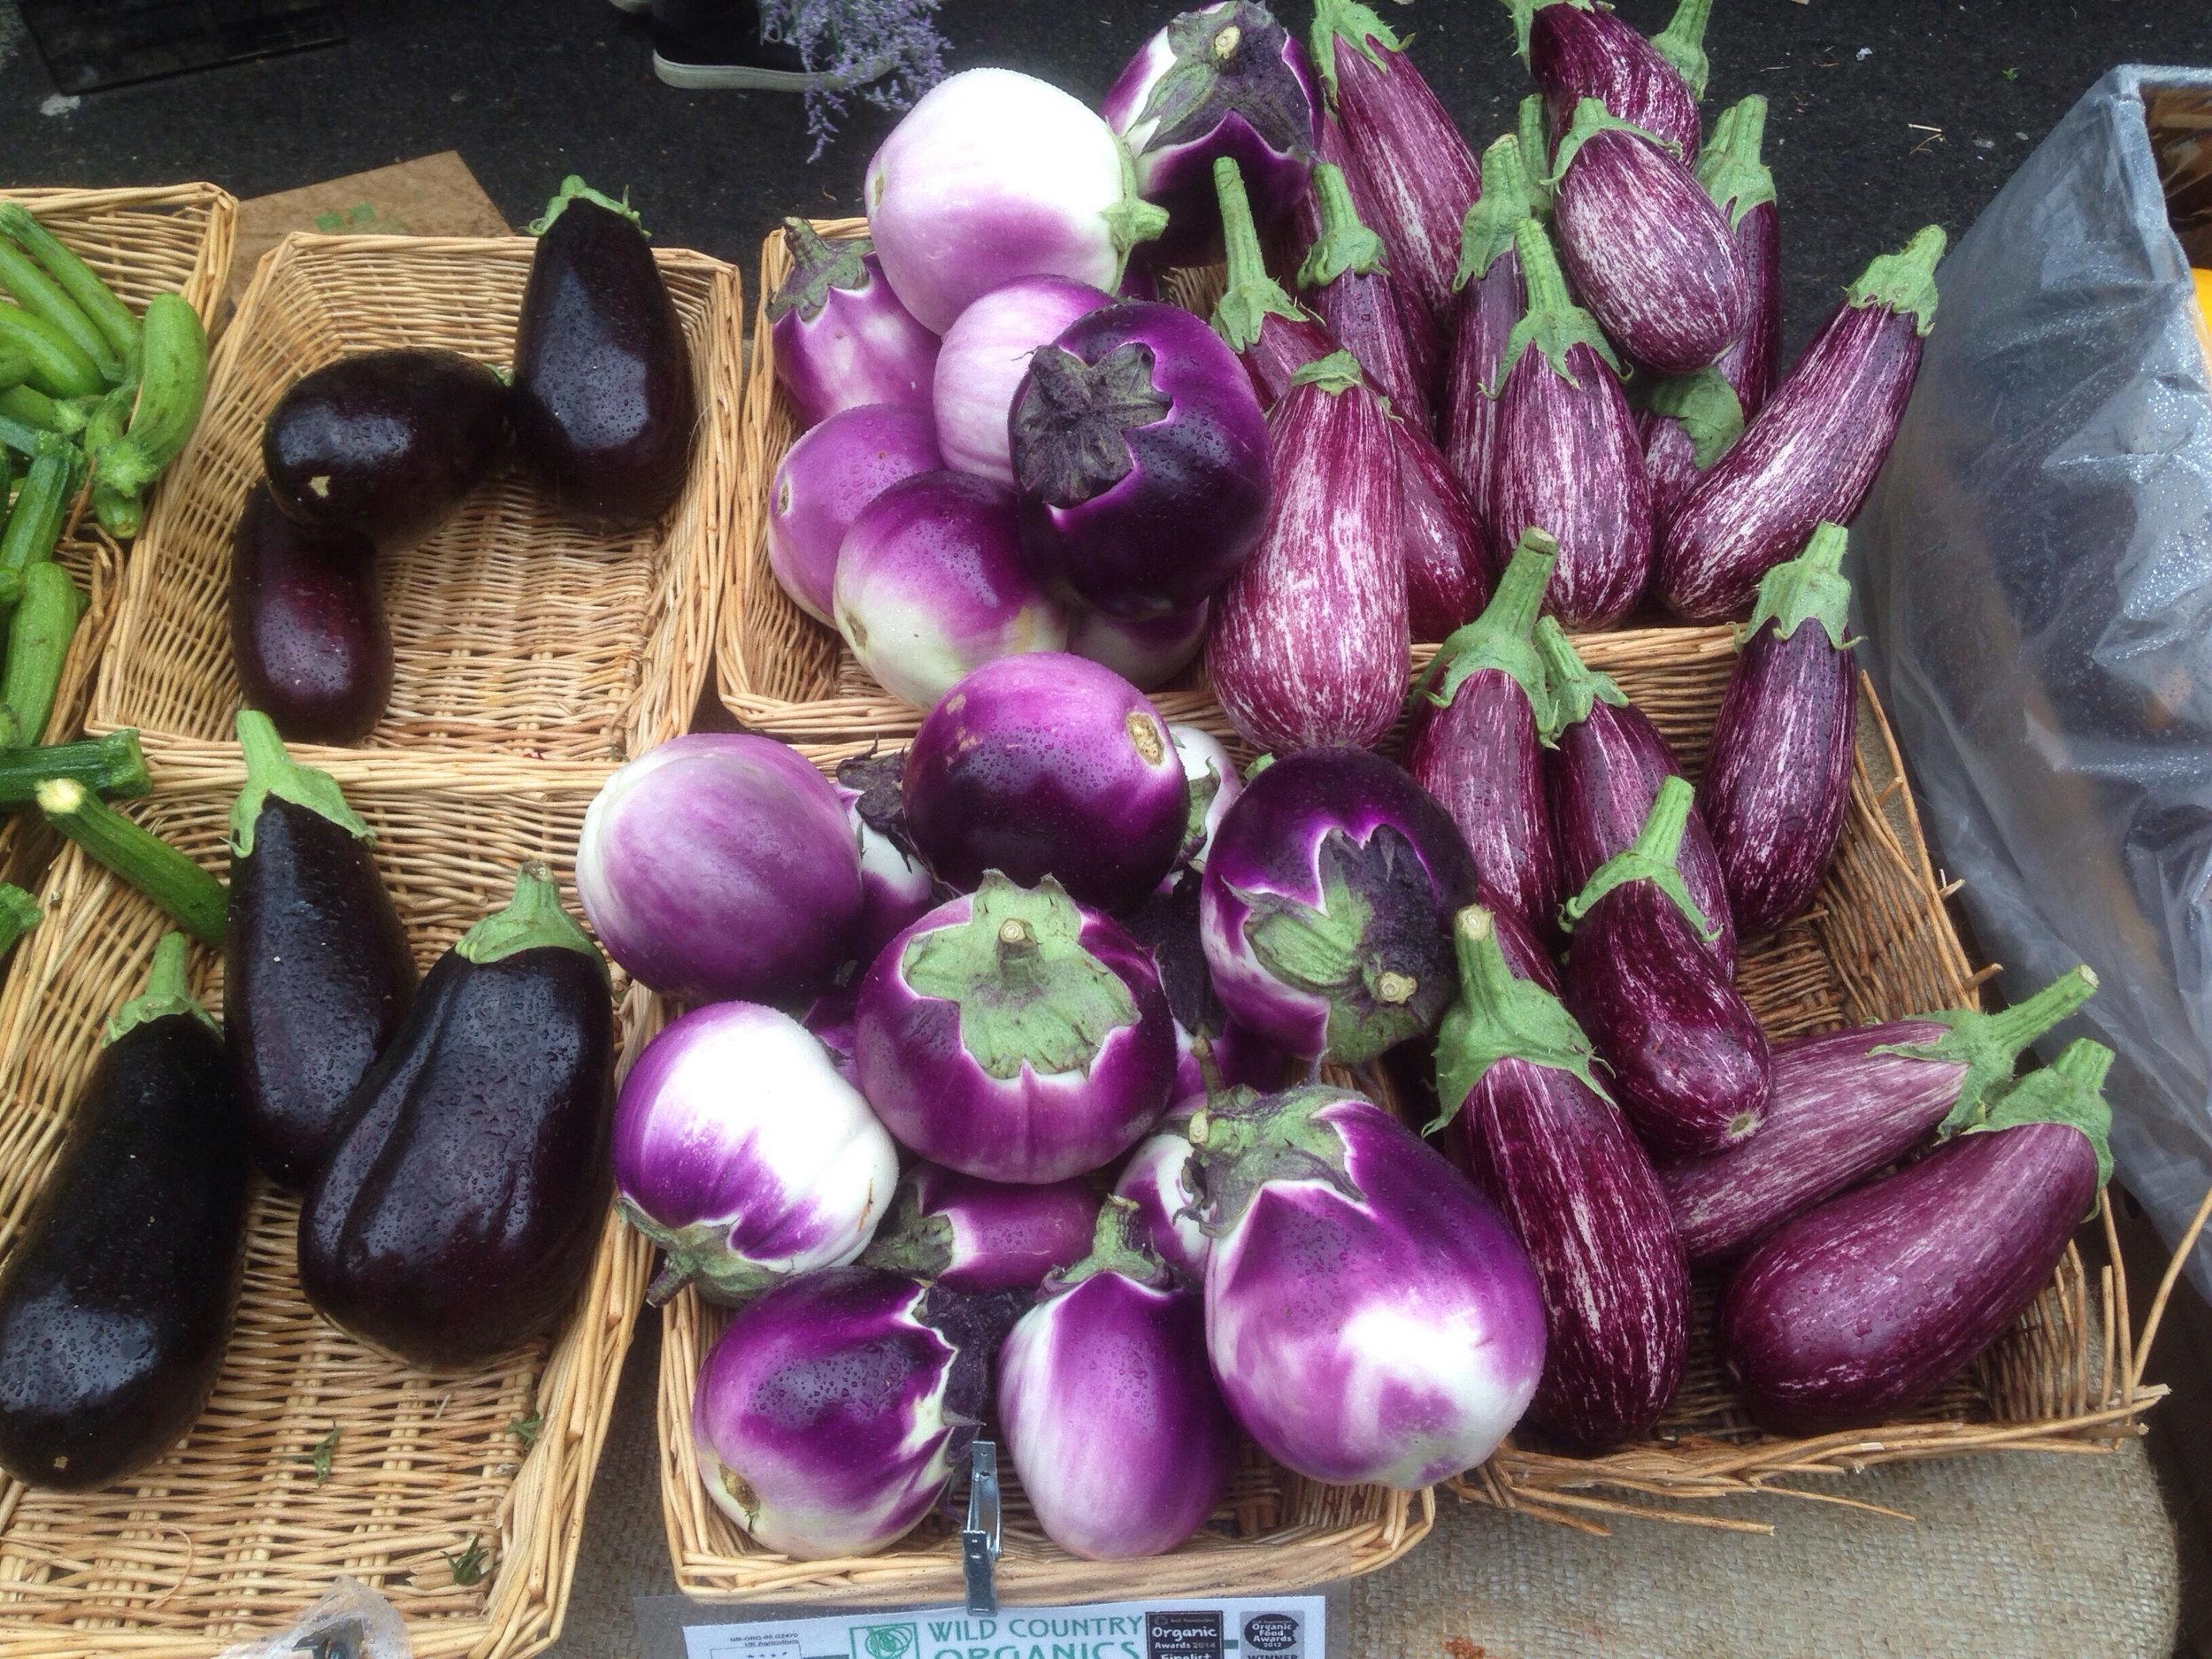 aubergine_market_london.jpg